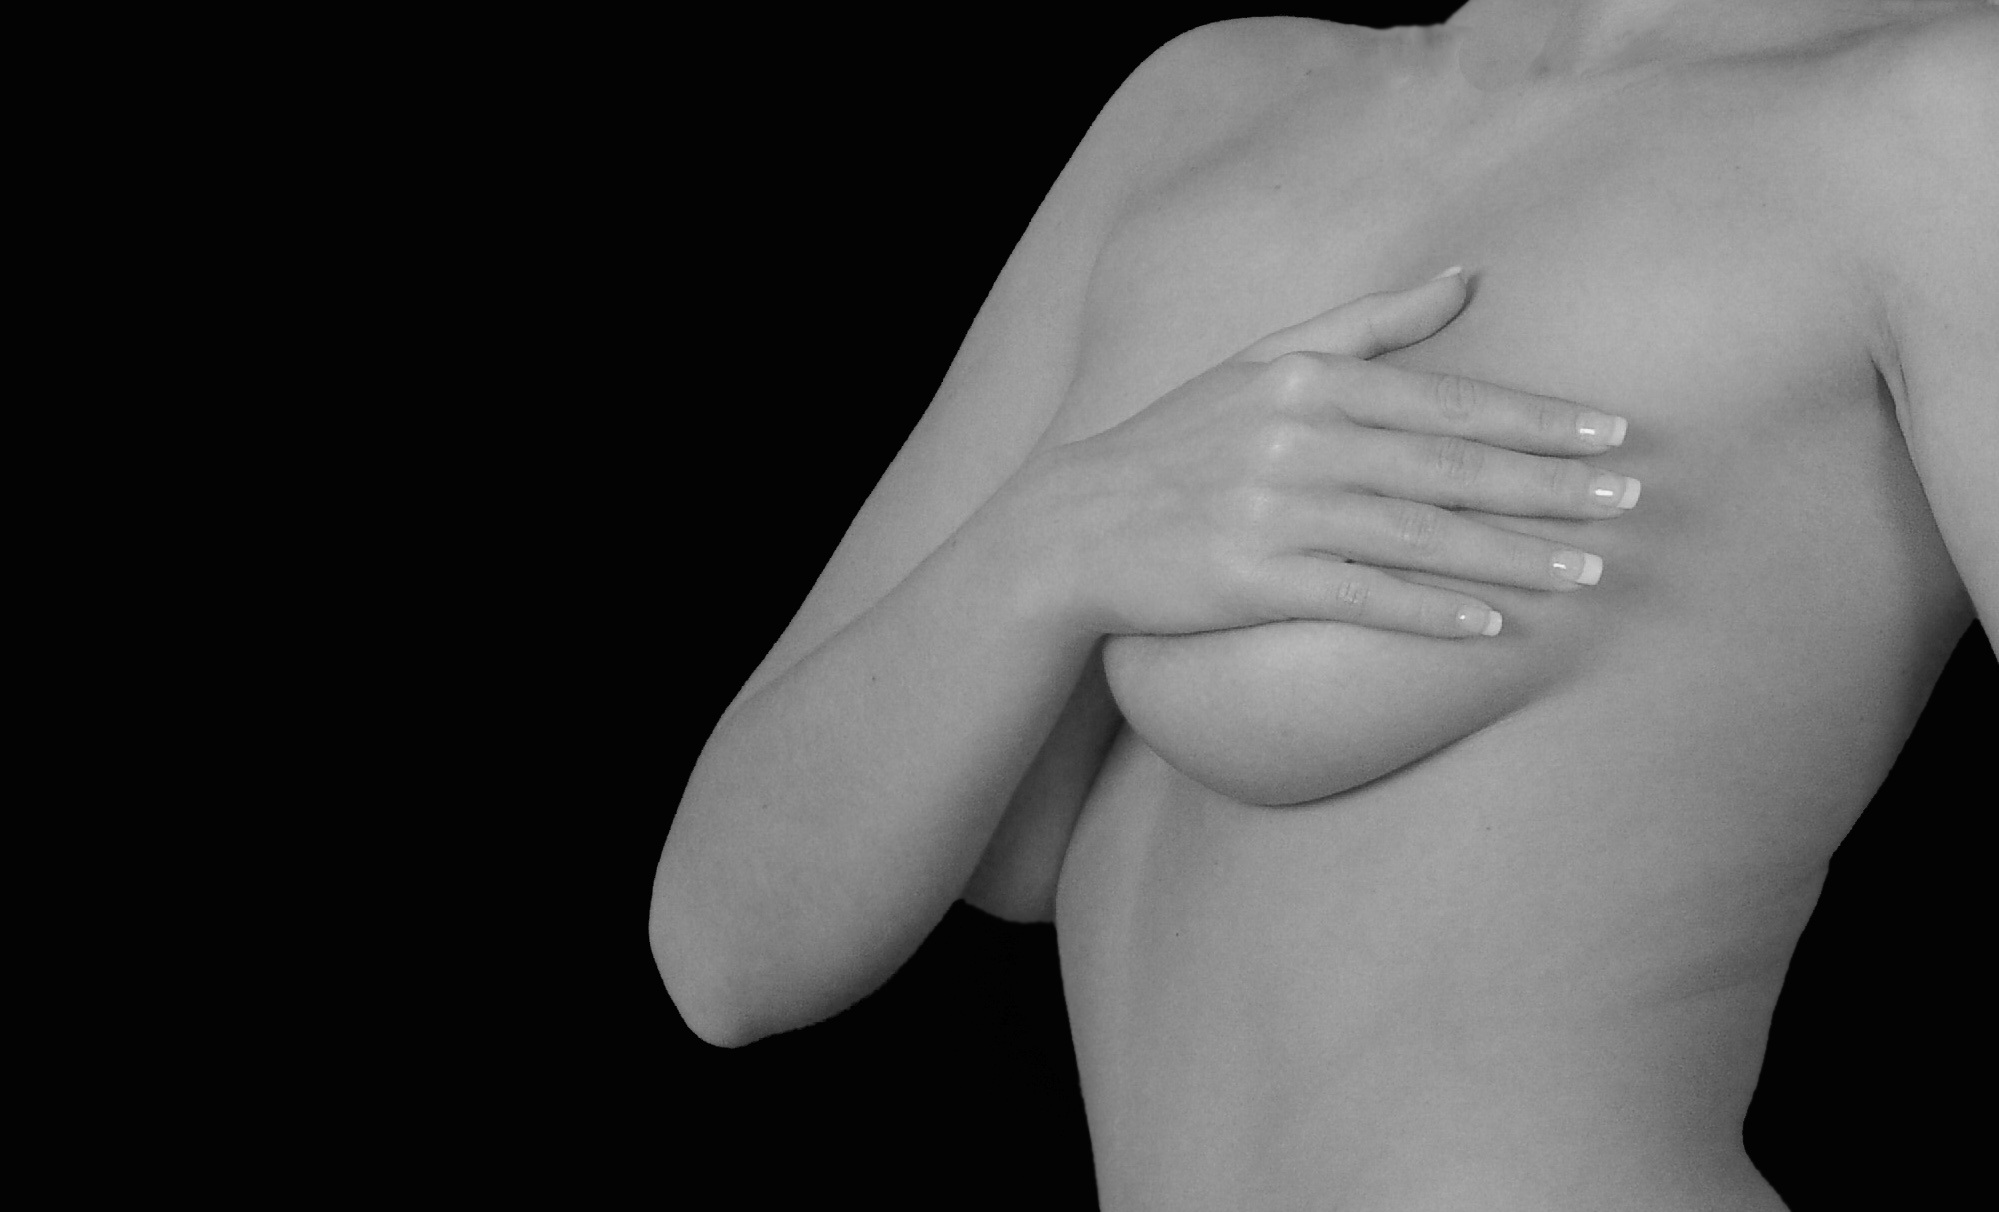 Aumento de mama con grasa propia